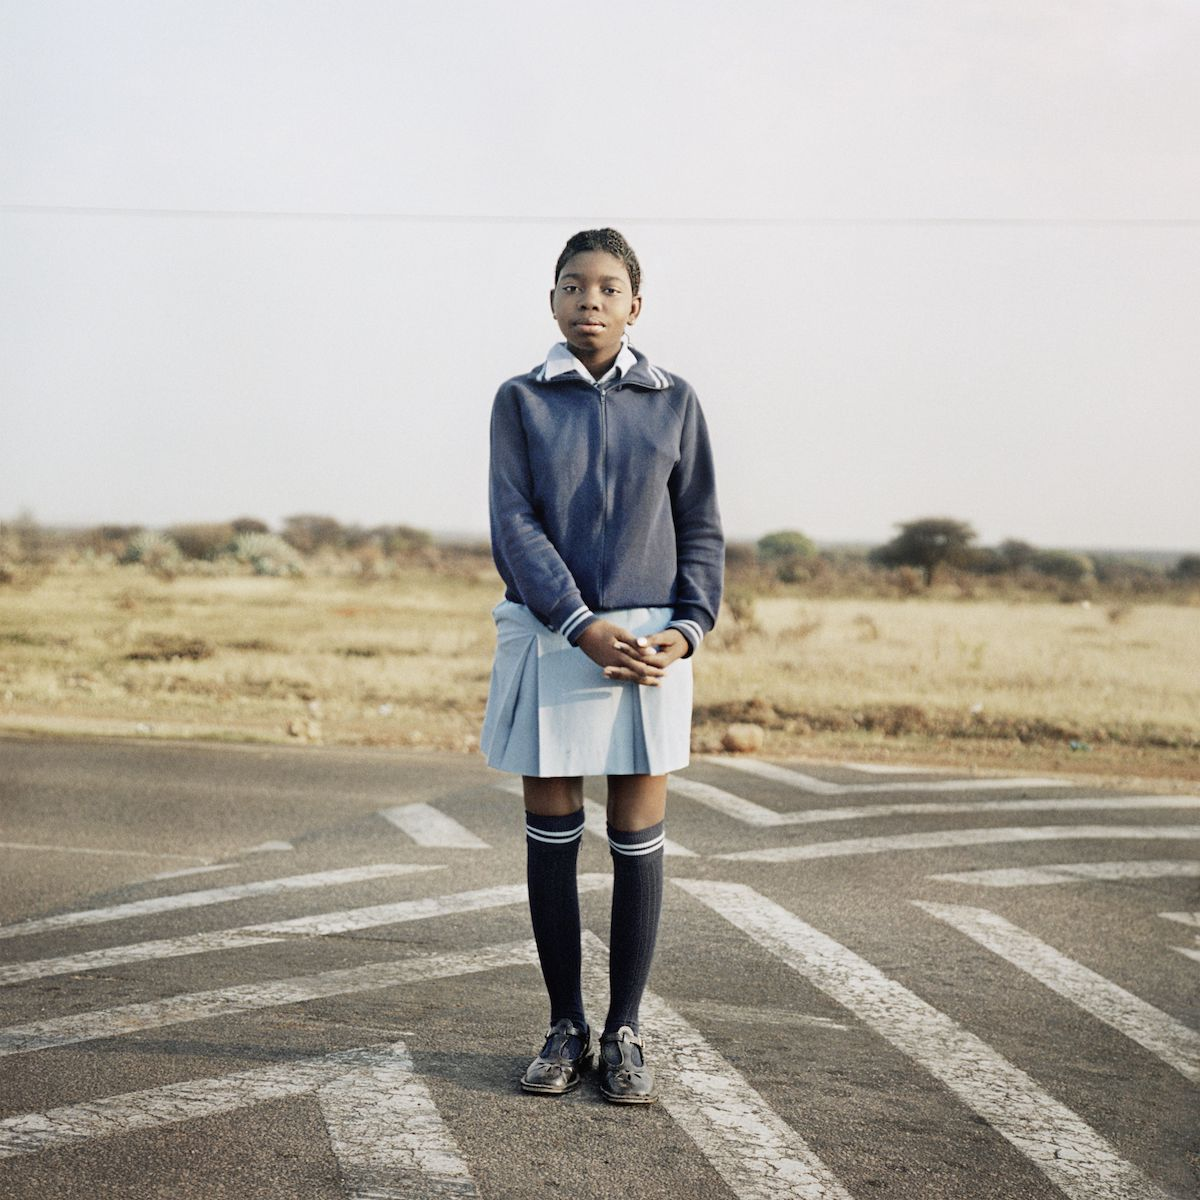 Homeland, Jane Nkuna. From the series Homeland. Loding, former Kwandebele. 2009. © Thabiso Sekgala and Goodman Gallery